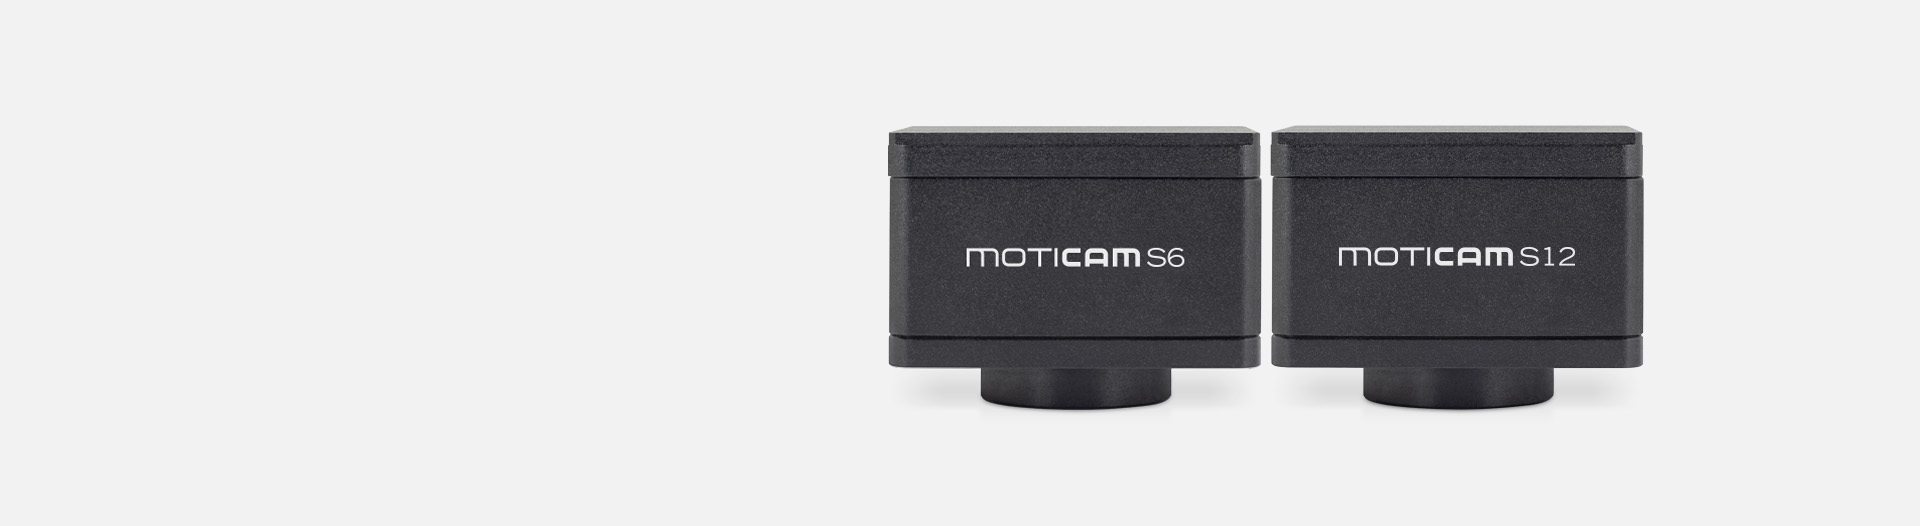 Moticam S6, Moticam S12 USB